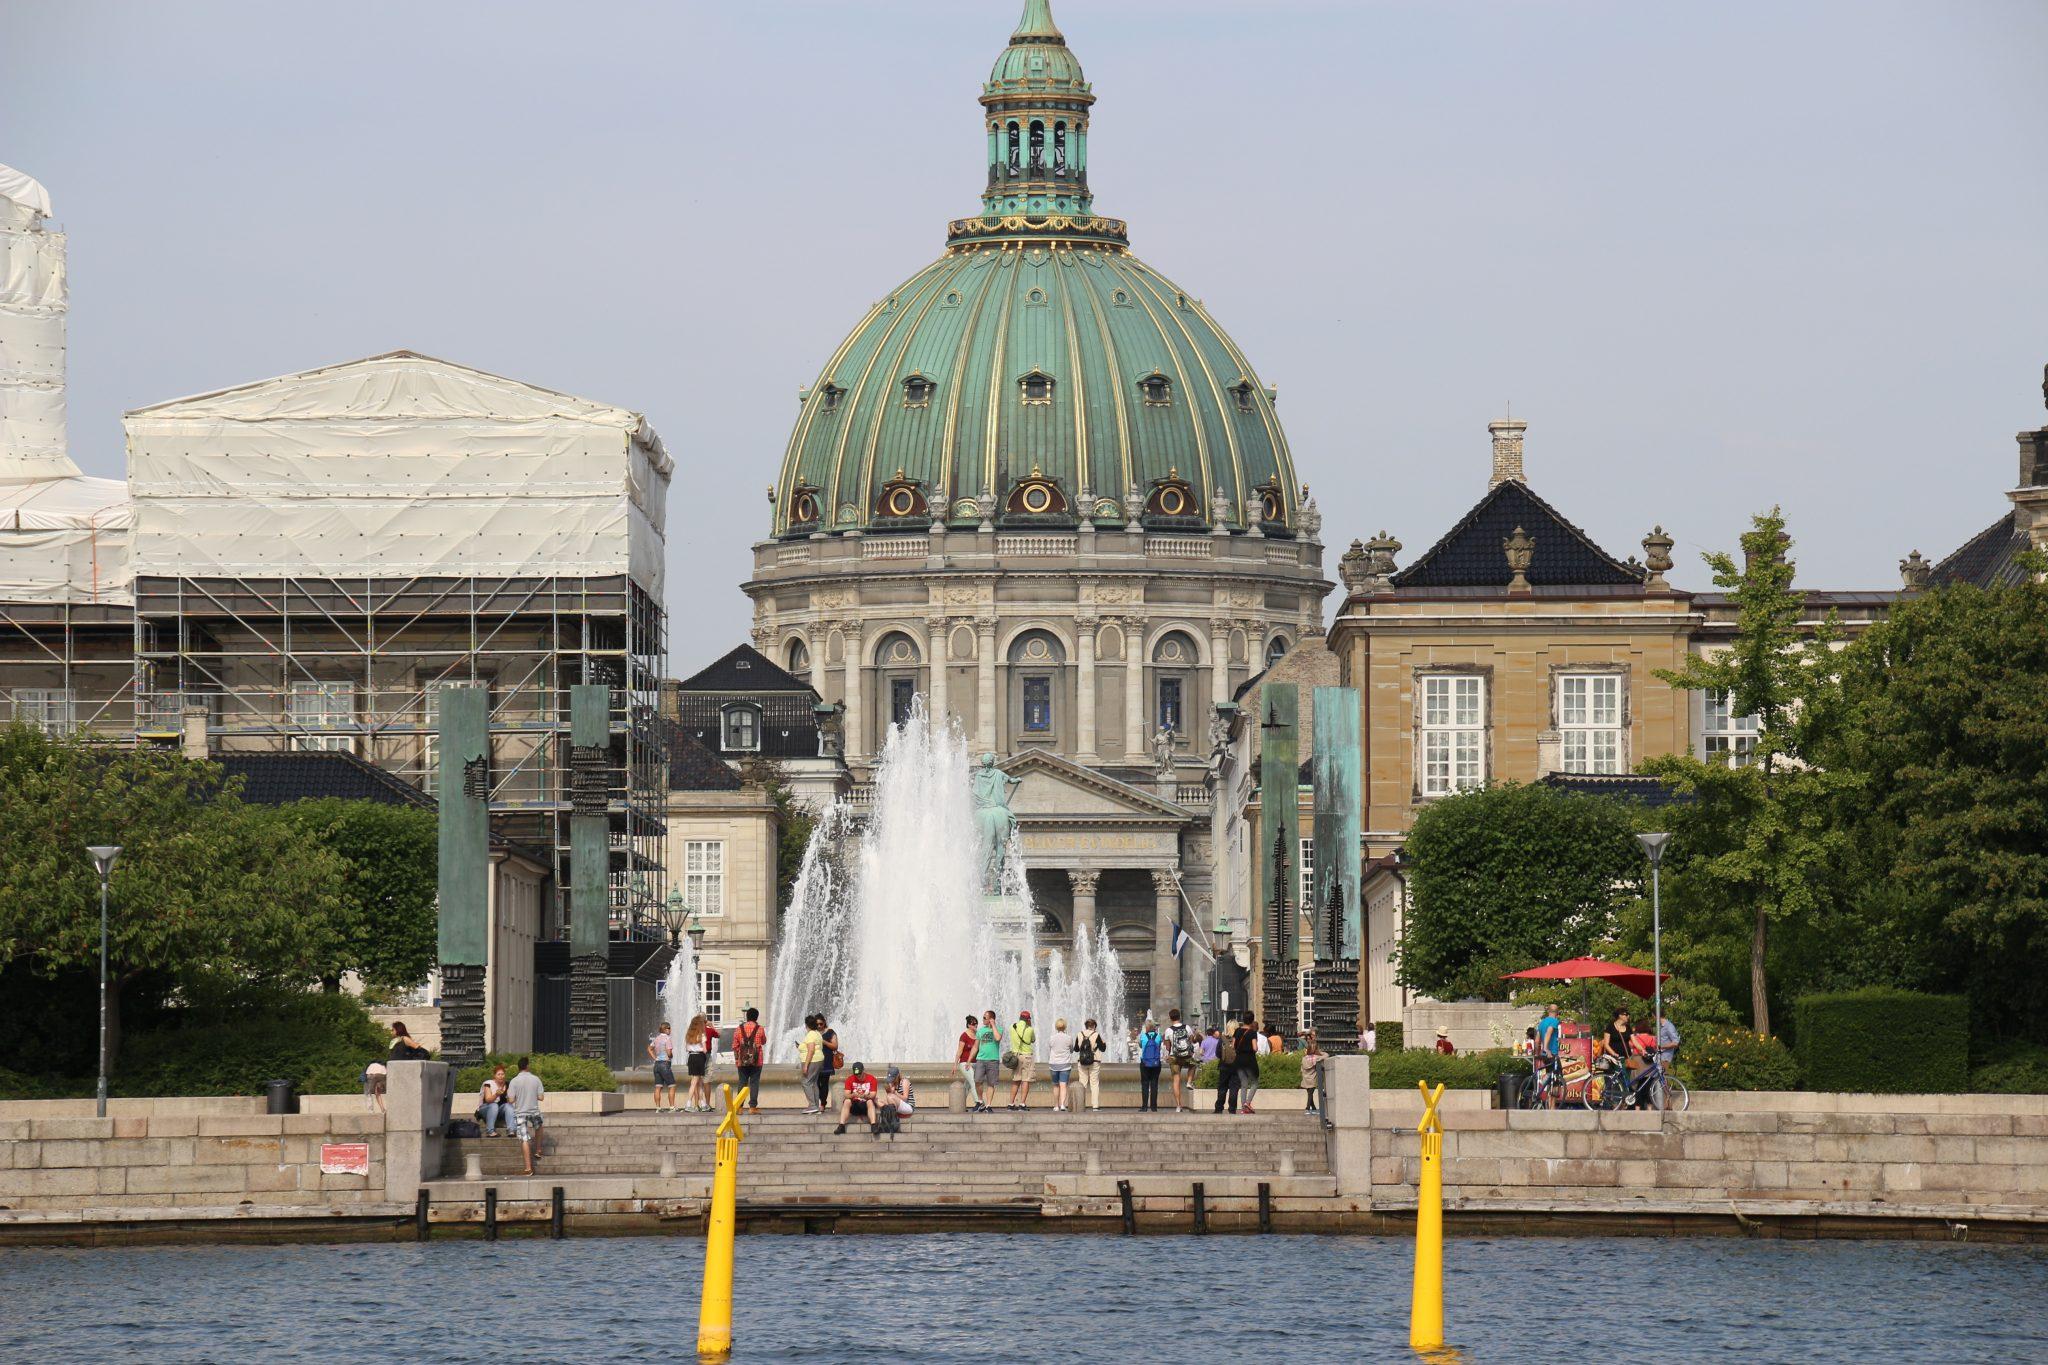 Amalienborg, the Danish Royal Family's winter home in Copenhagen